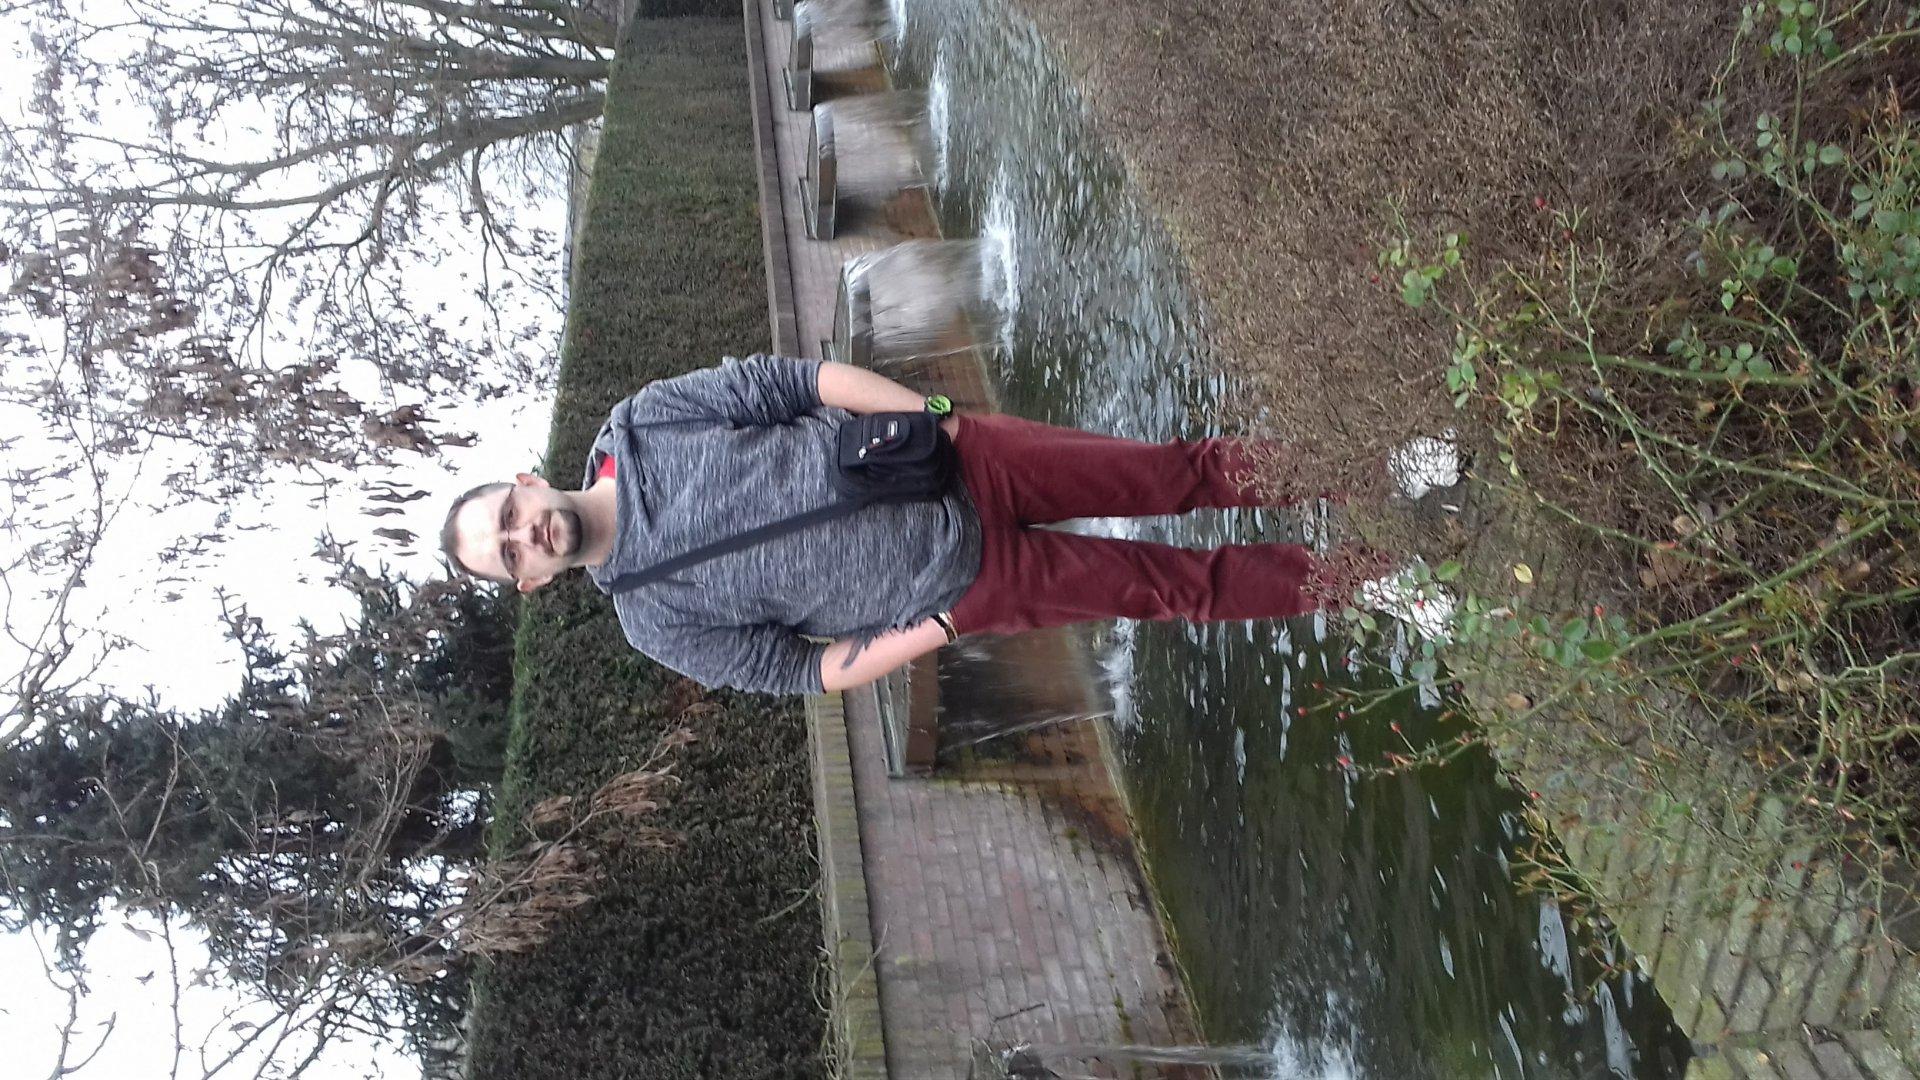 Lukasz 85 uit Limburg,Nederland